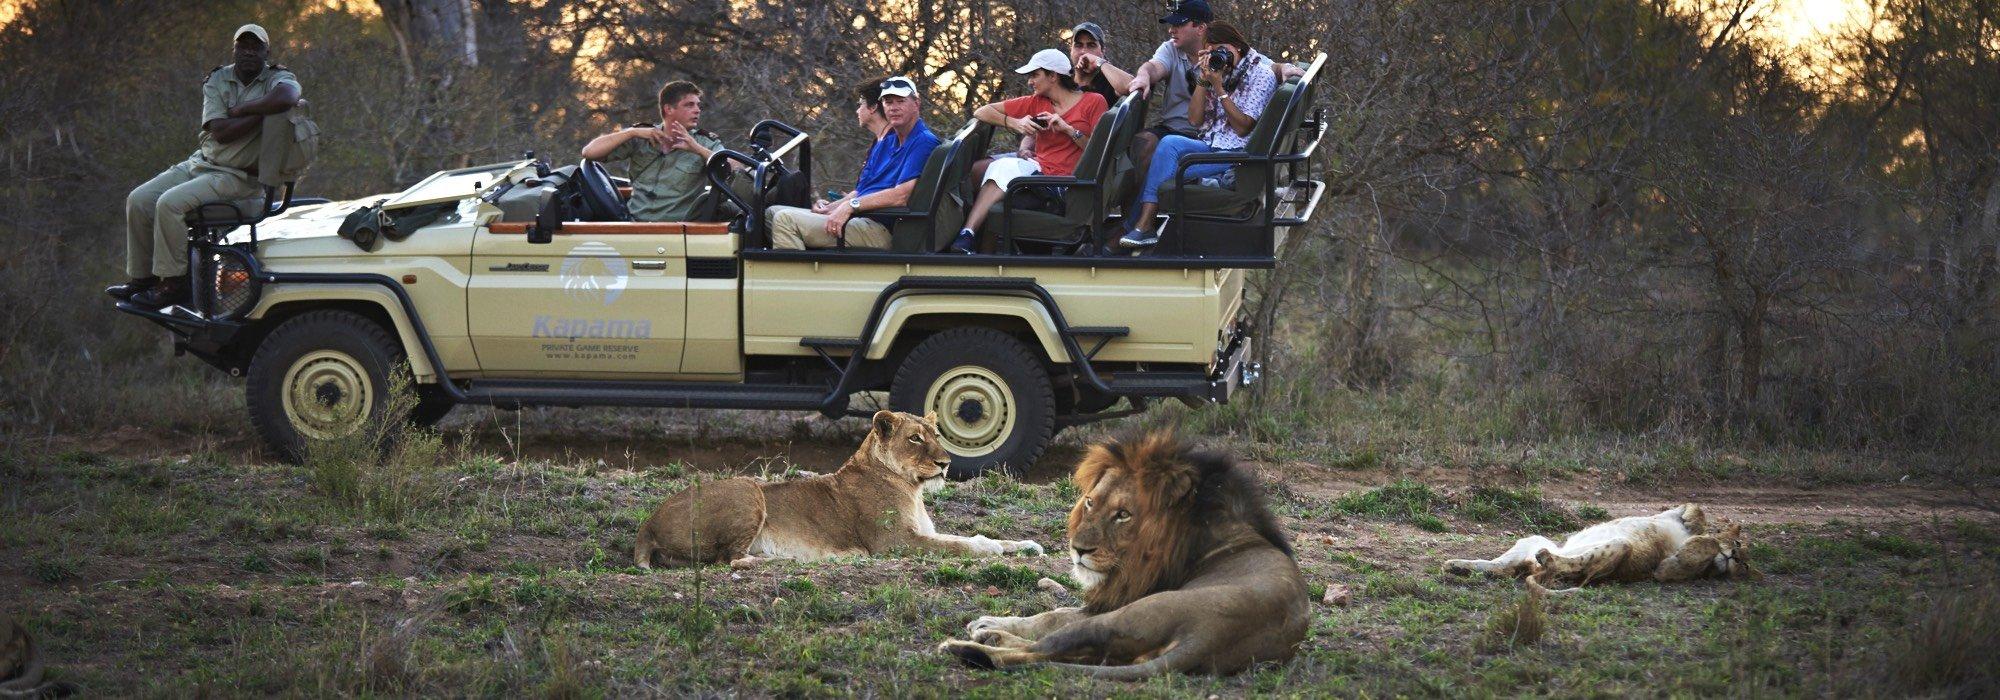 Lions on safari at Kapama